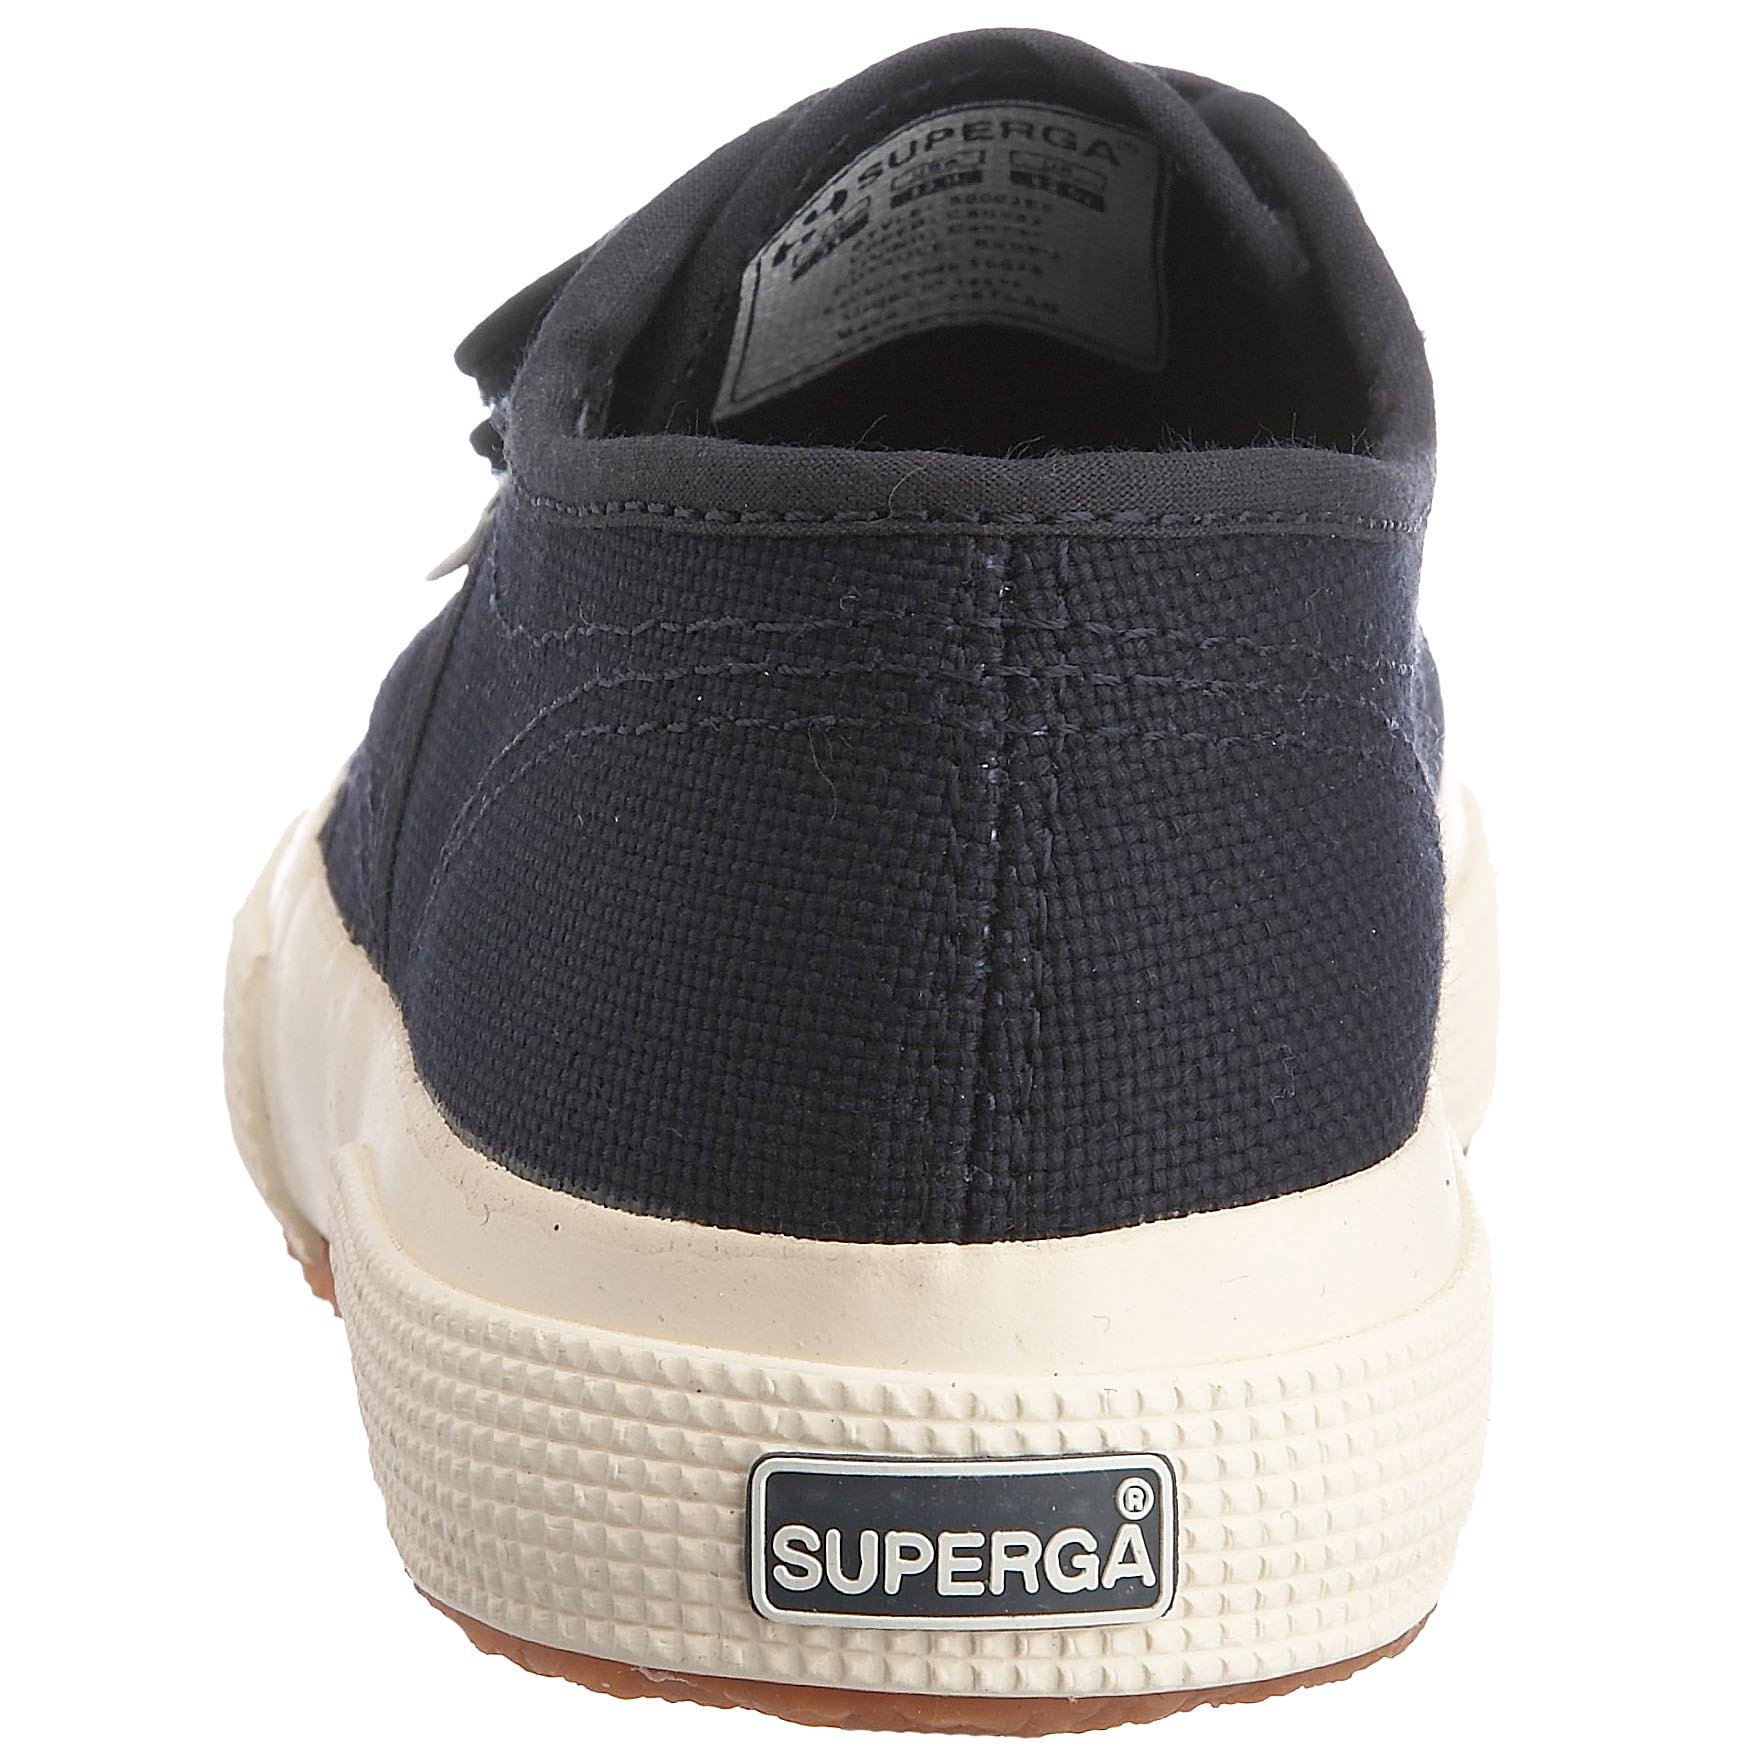 Superga Junior 2750 JVEL Canvas Trainer Navy-933 Gs0003E0 11.5 Child UK by Superga (Image #2)